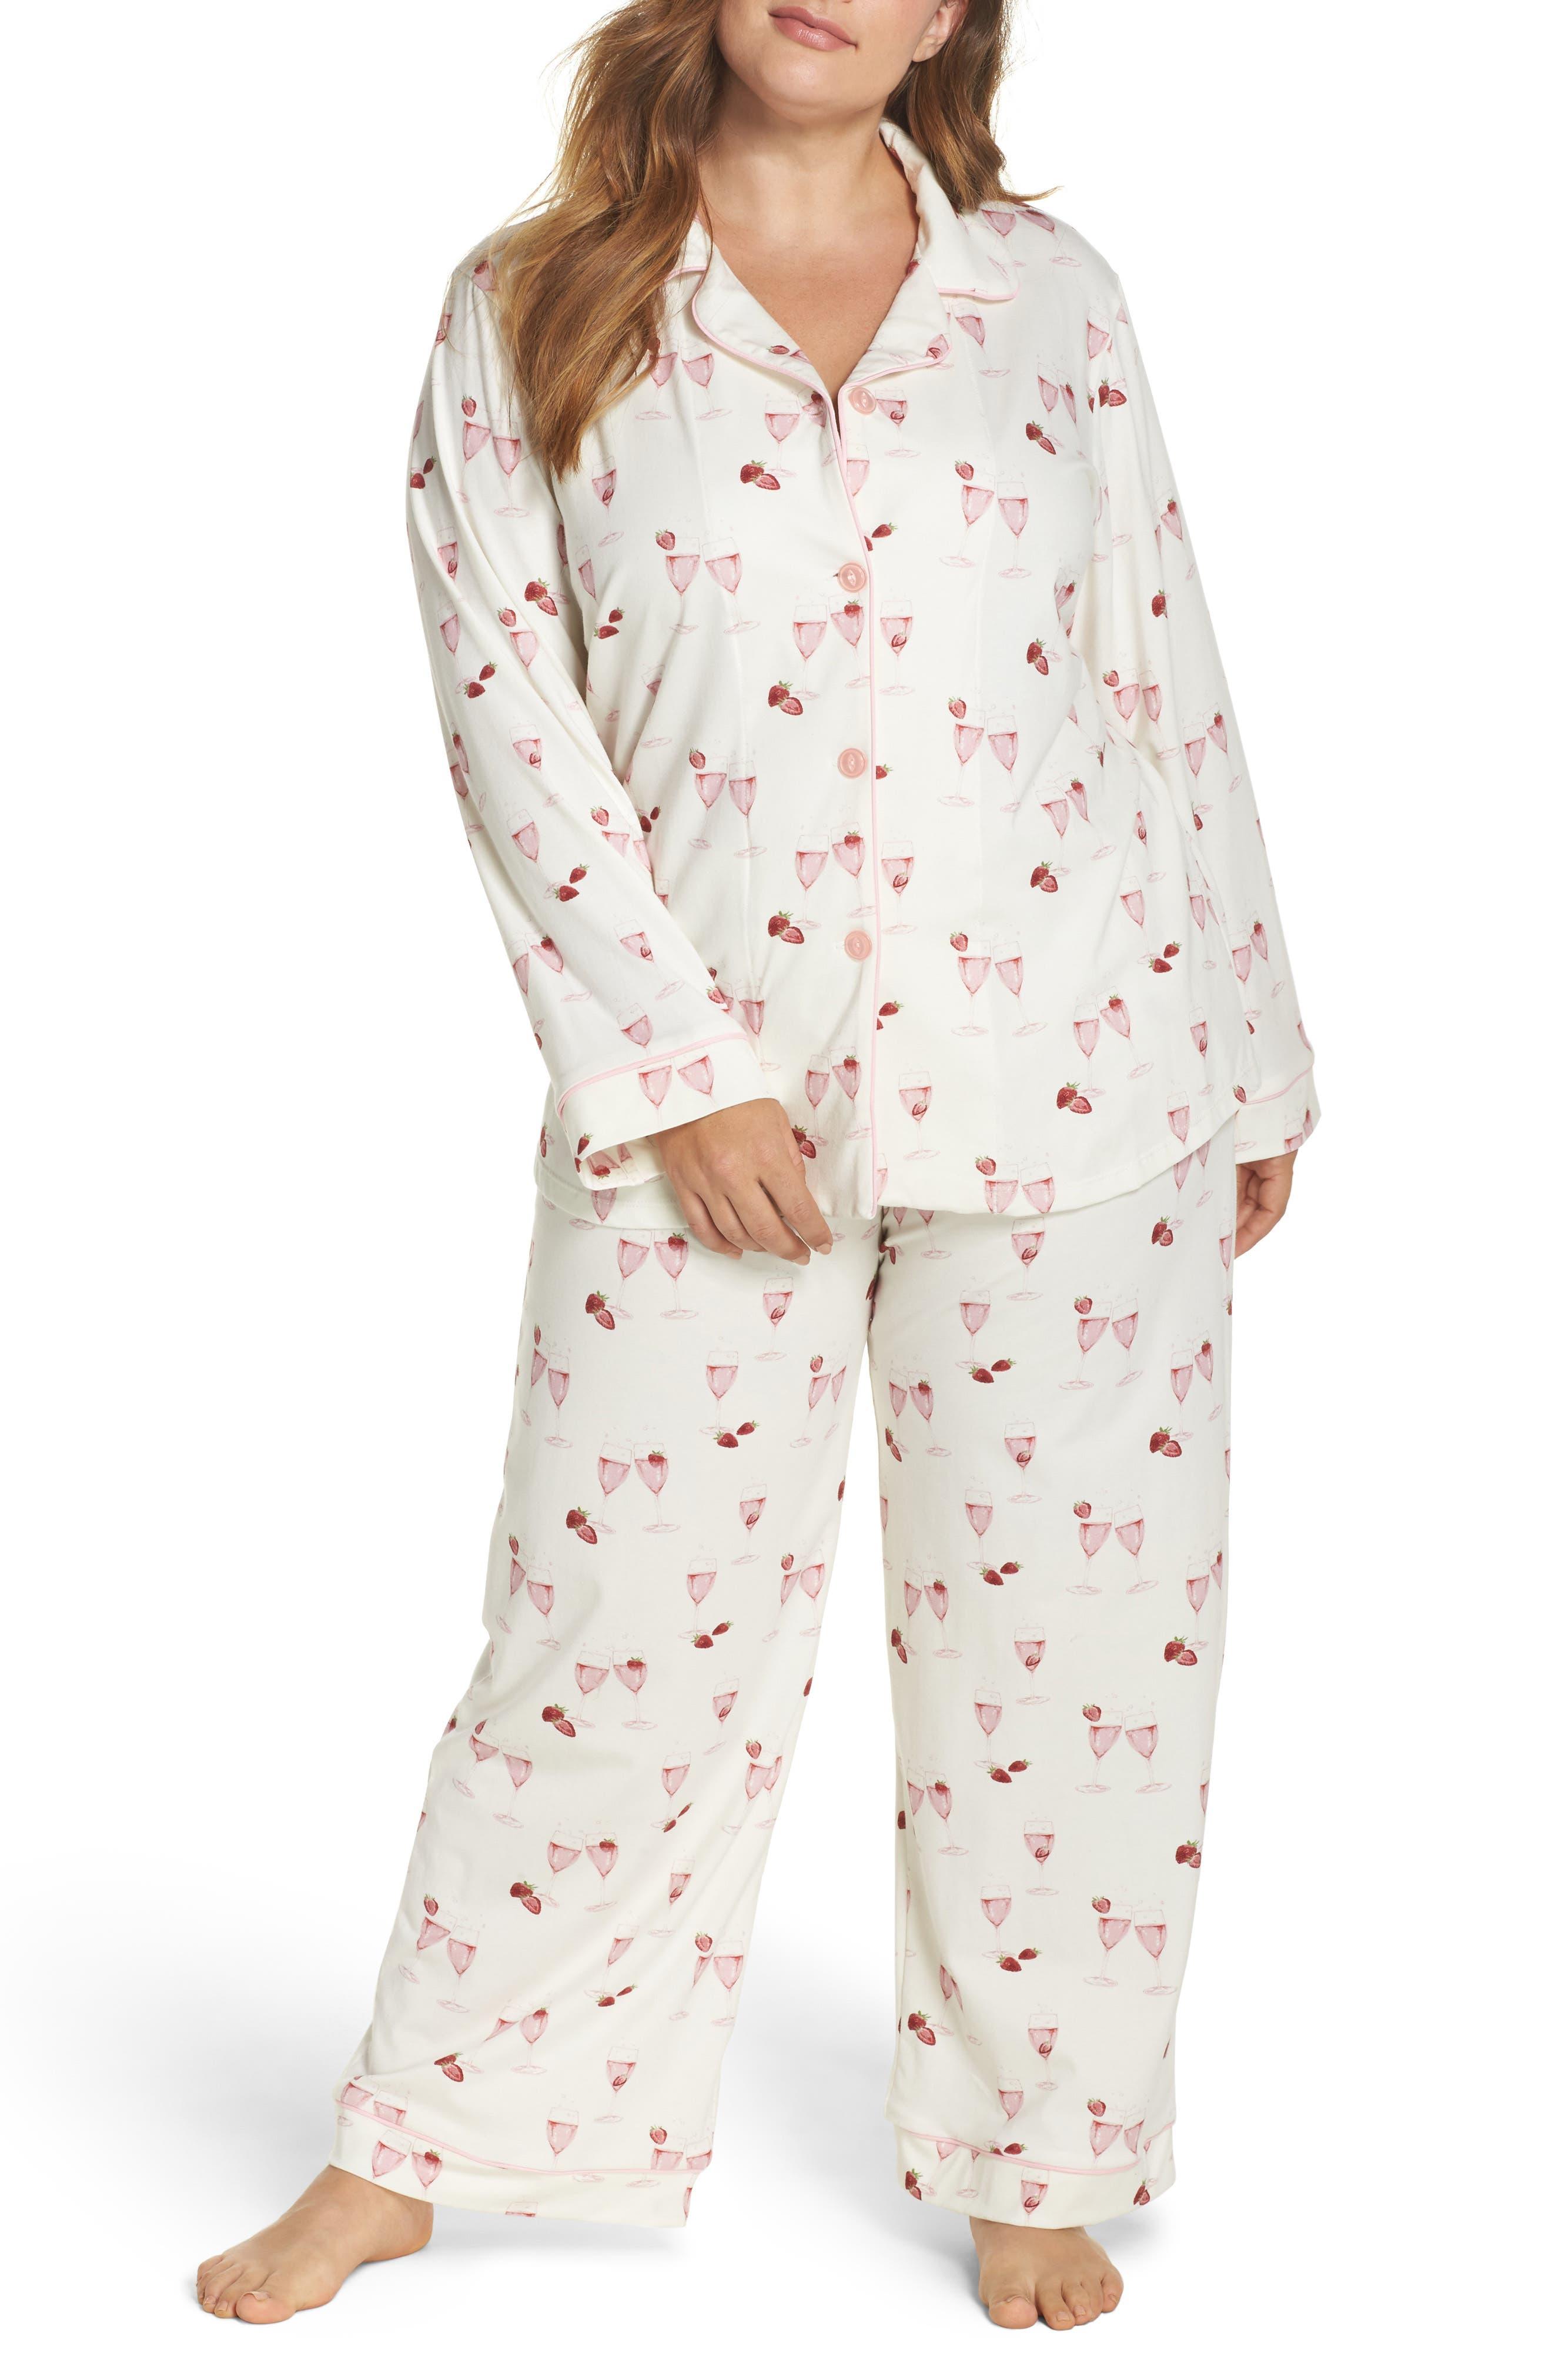 Strawberries & Champagne Print Pajamas,                         Main,                         color, Strawberries And Champagne